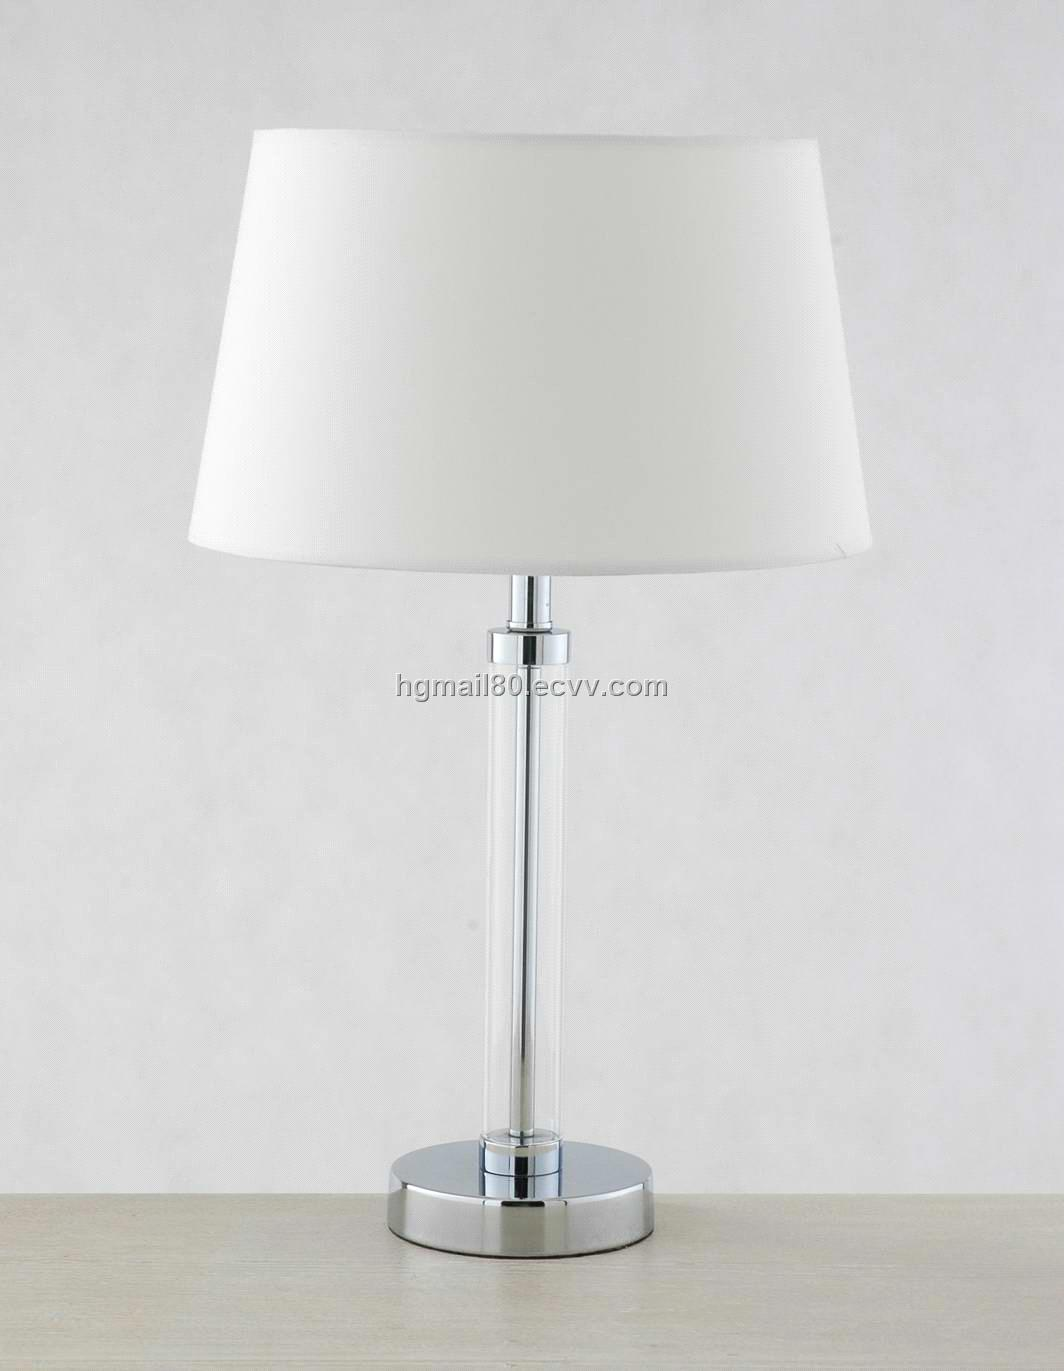 home lighting/decorative lamp